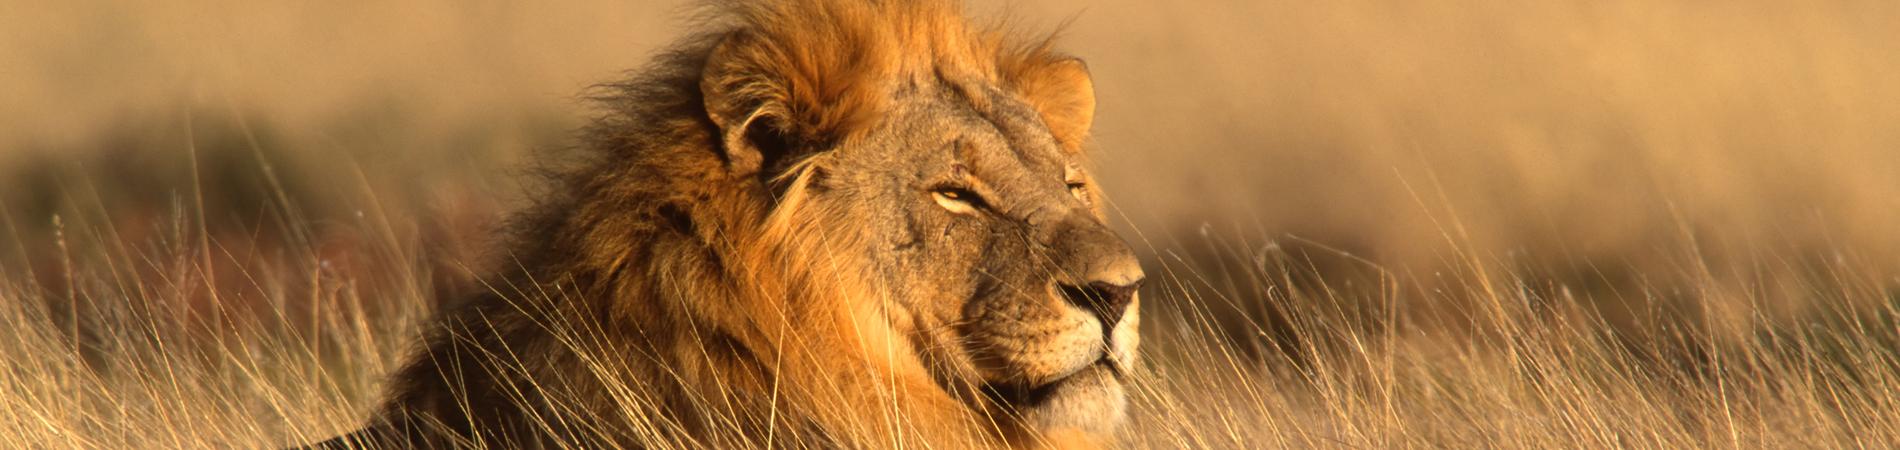 shutterstock nam lion header